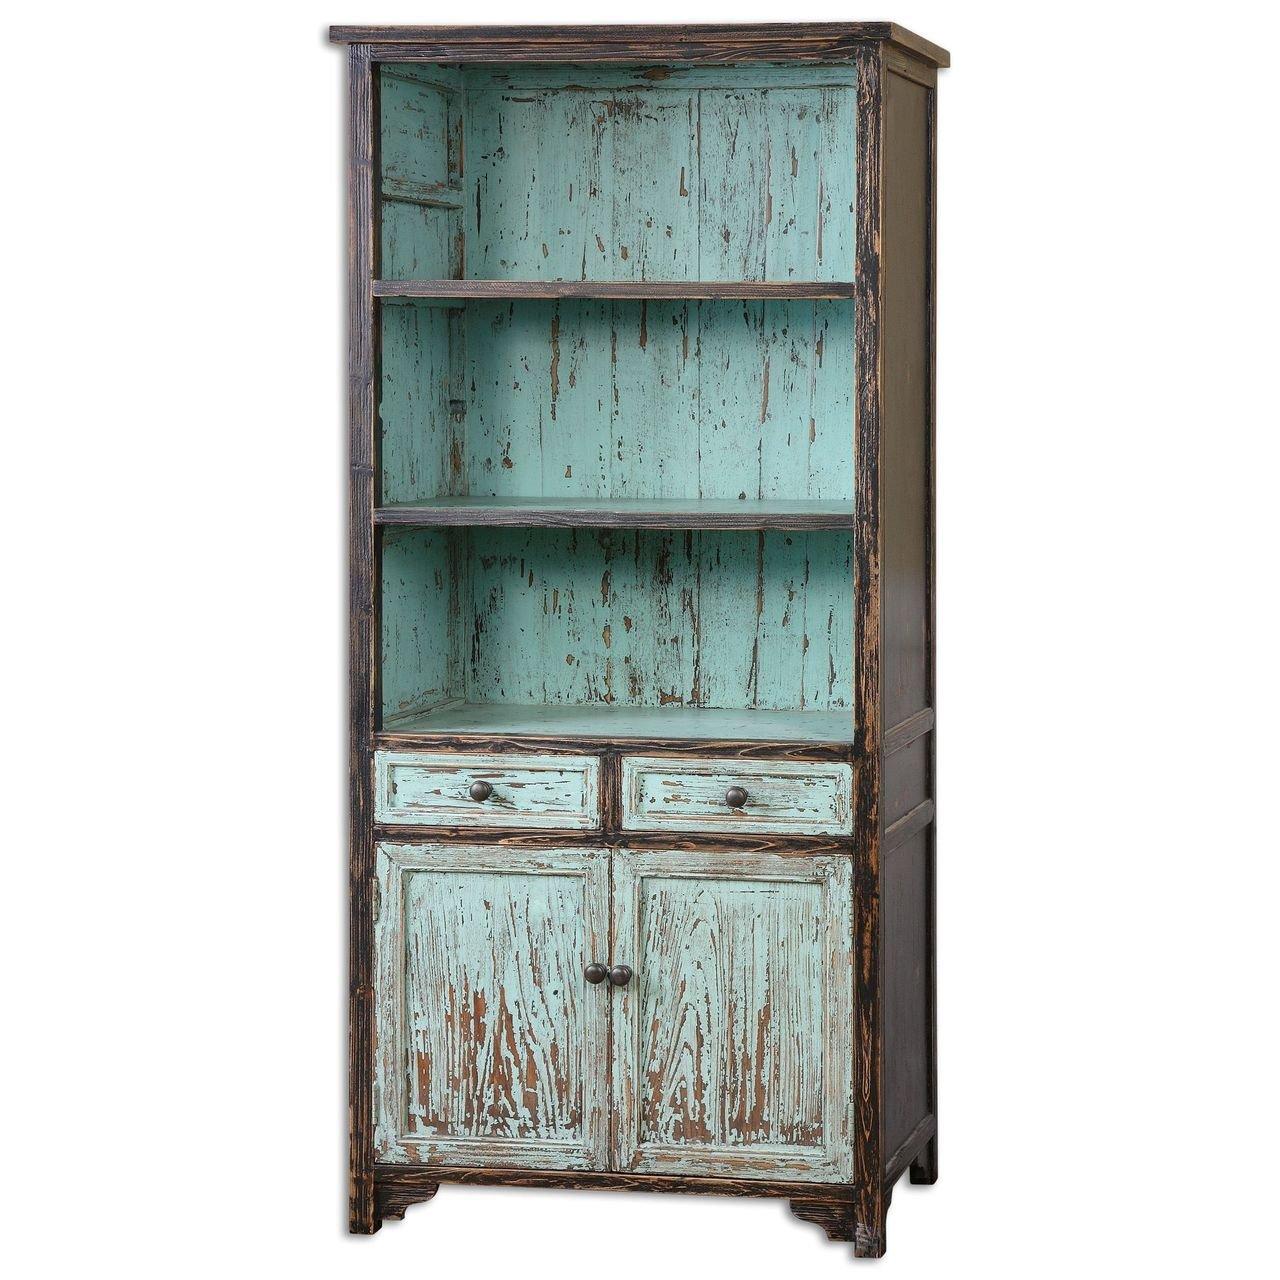 Aqua Turquoise Distressed Bookshelf | Cottage Blue Bookcase Shelf 0